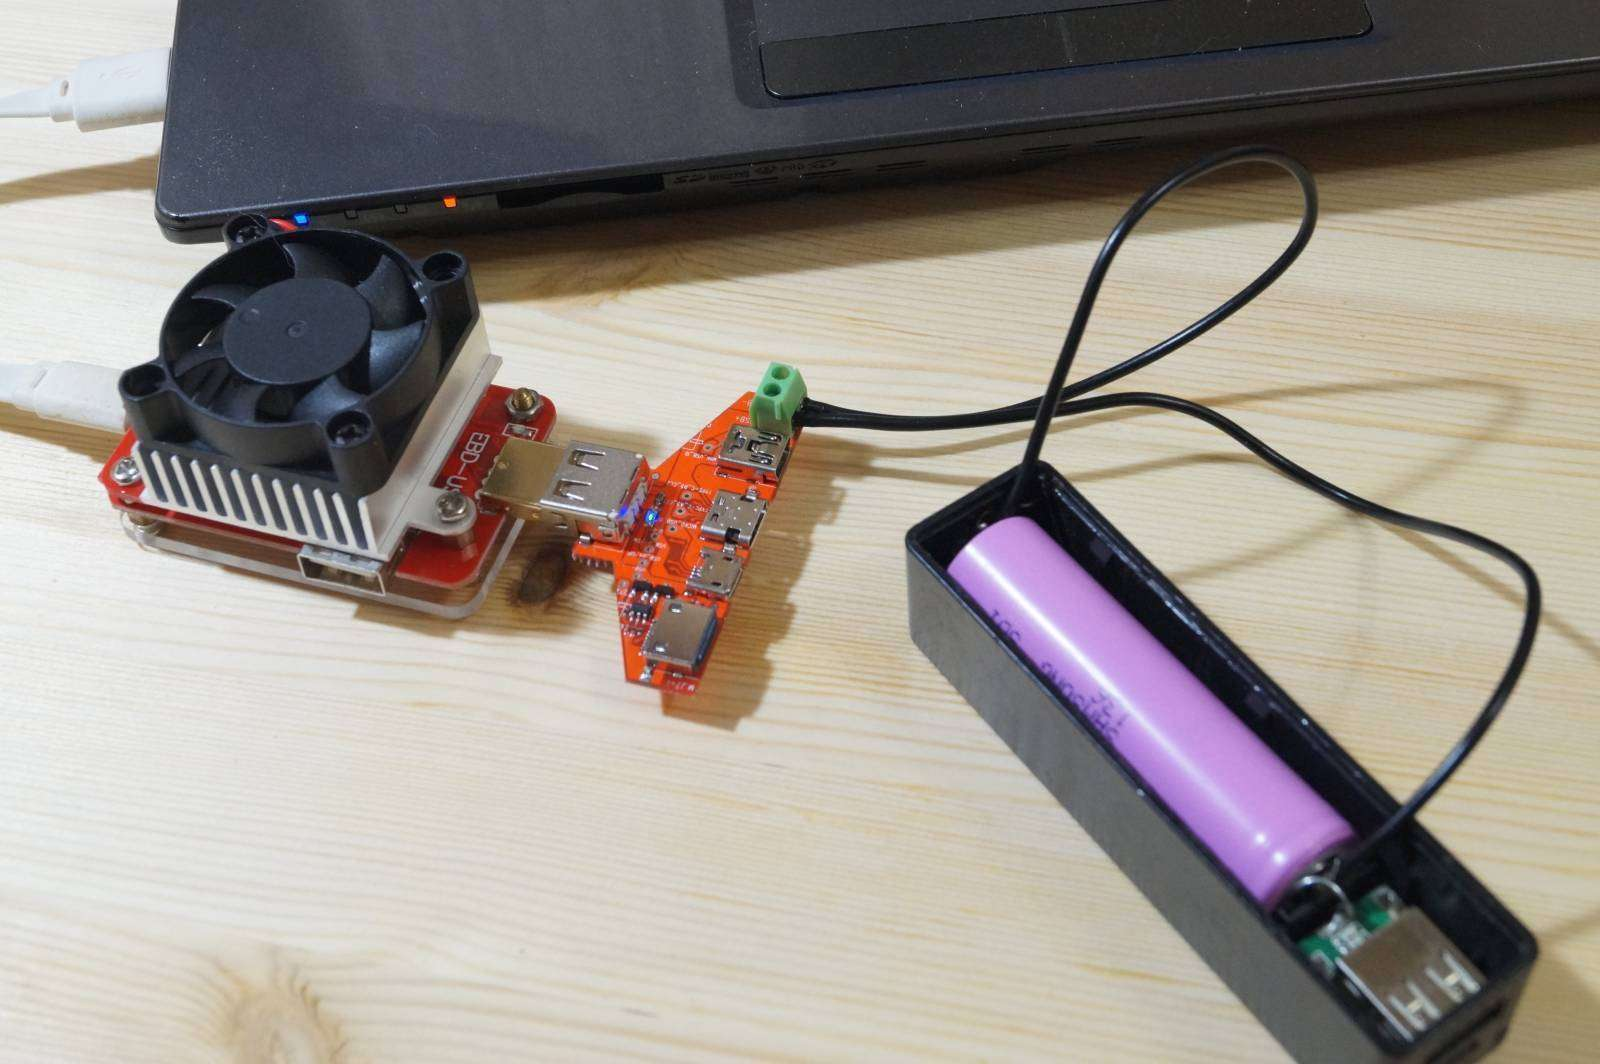 Aliexpress: Еще немного про адаптер от JUWEI